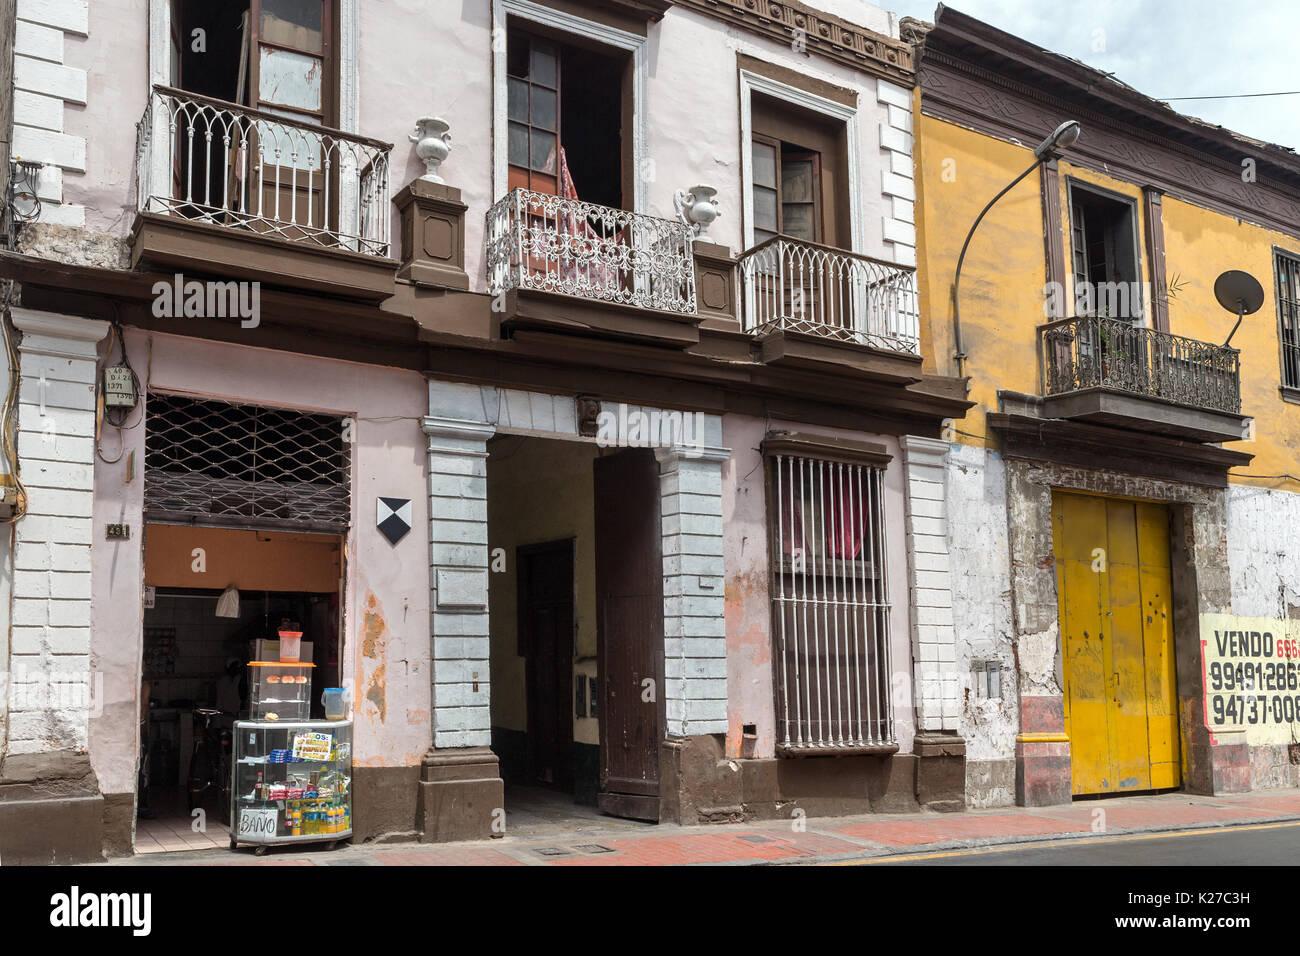 Old buildings Lima Peru - Stock Image